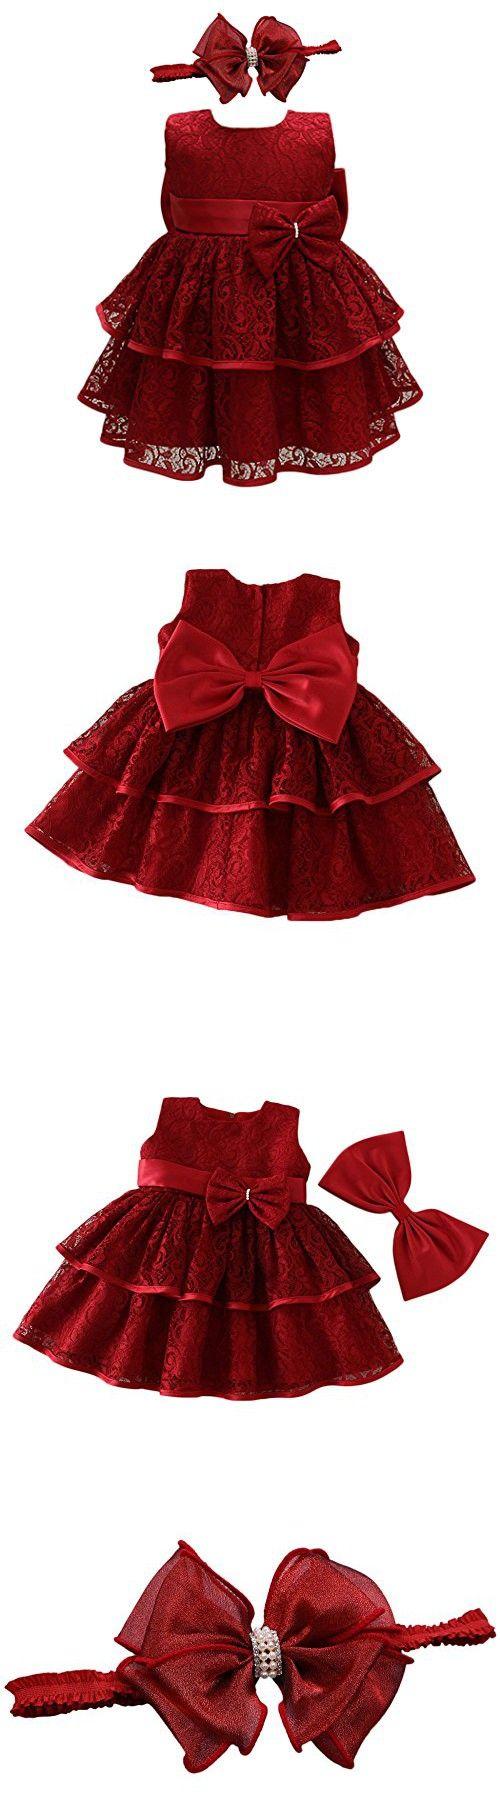 b79512ecd149 Glamulice Baby Lace Party Dress Christening Baptism Girl Dresses (6M ...